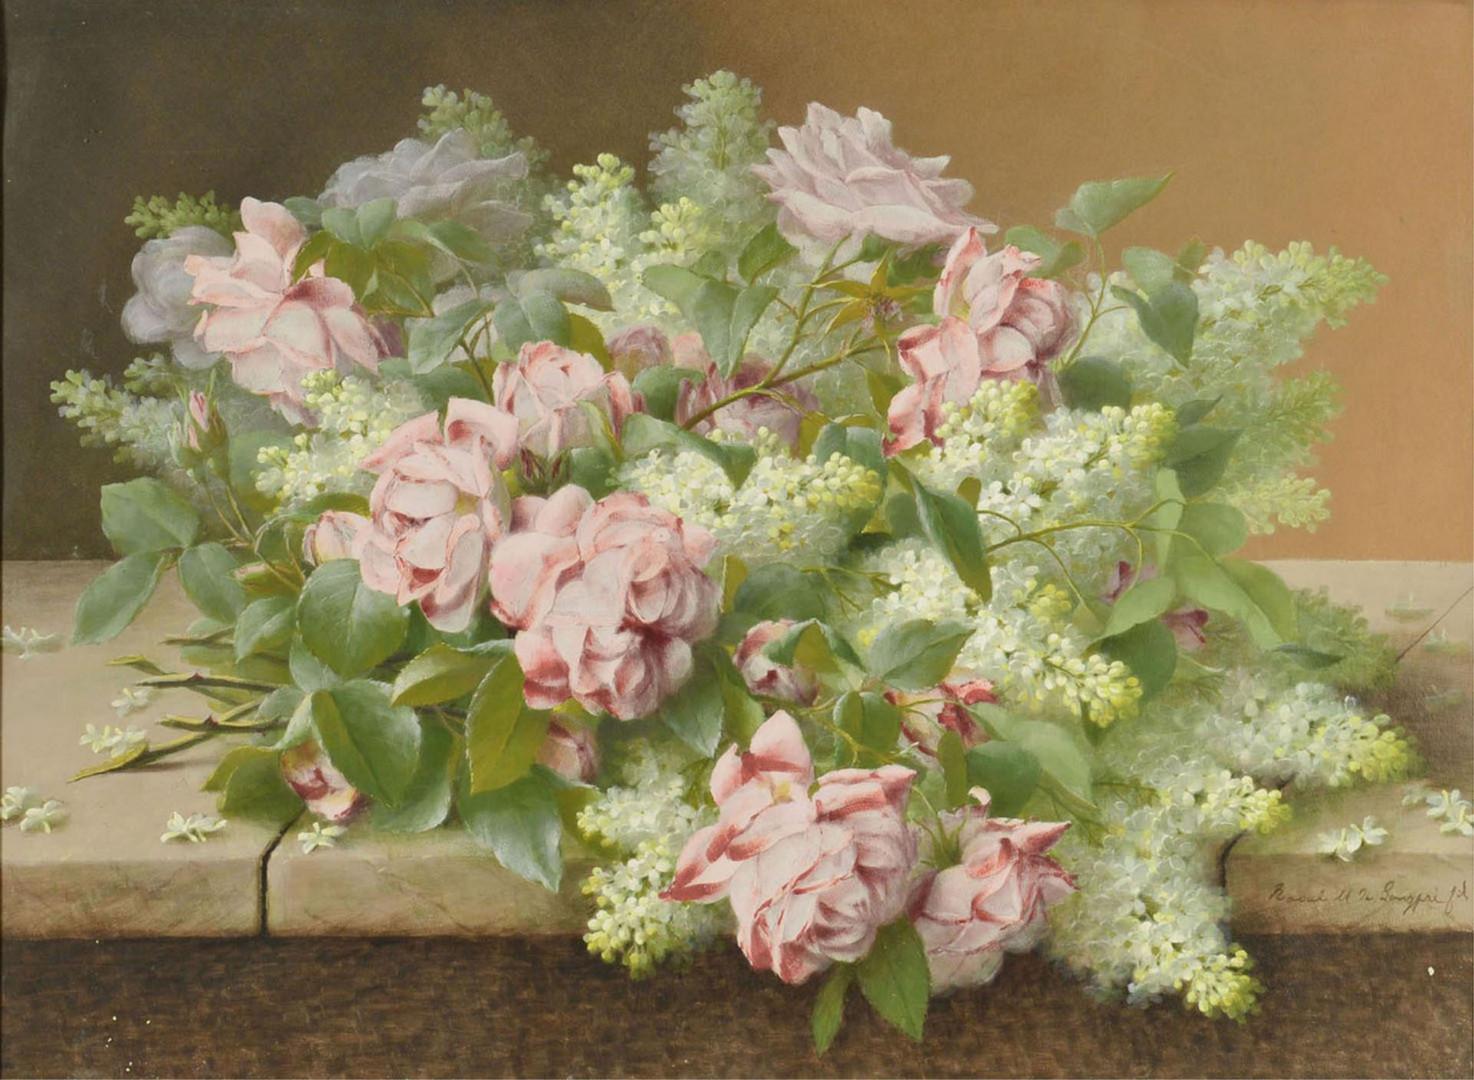 Lot 855: Raoul De Longpre Floral Still Life Painting